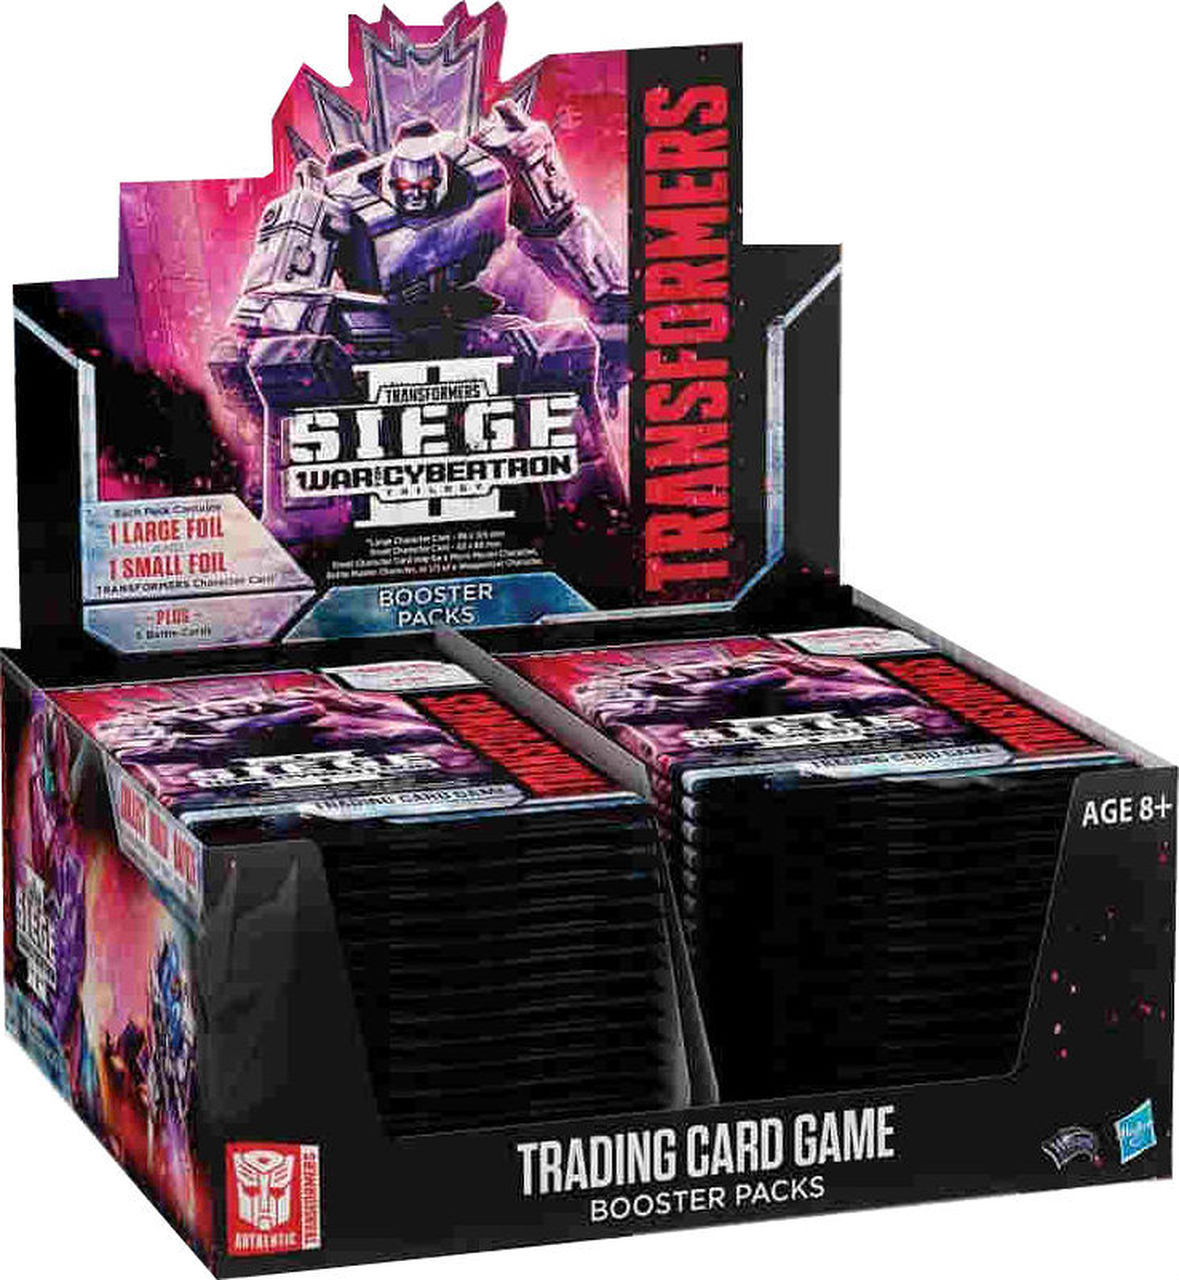 Transformers TCG - Siege II Booster Disp